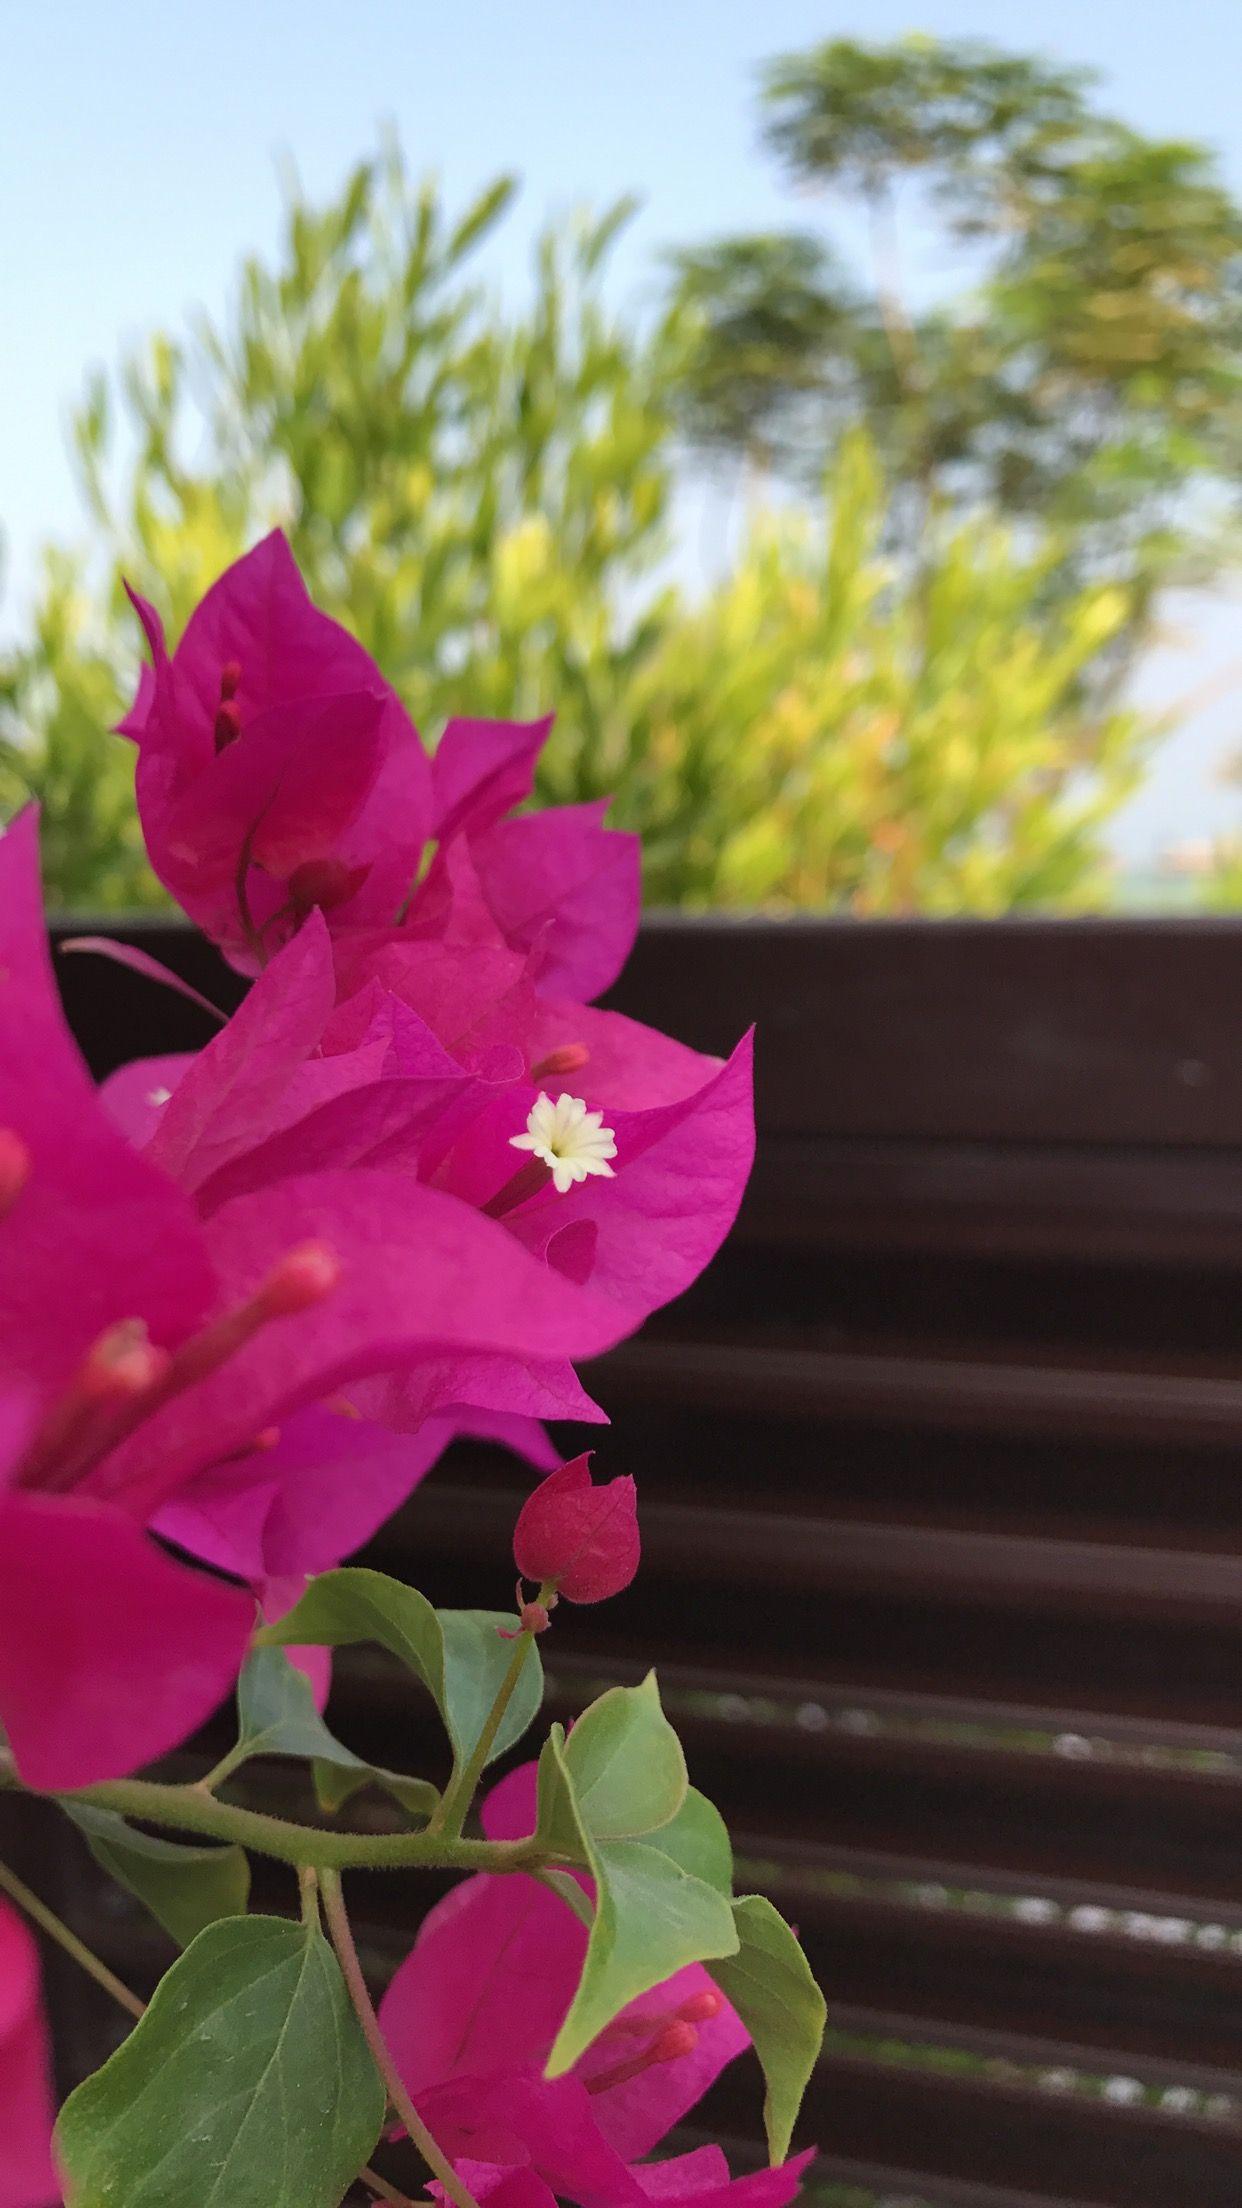 Pin By بثينة الكواري On ورد الربيع Plants